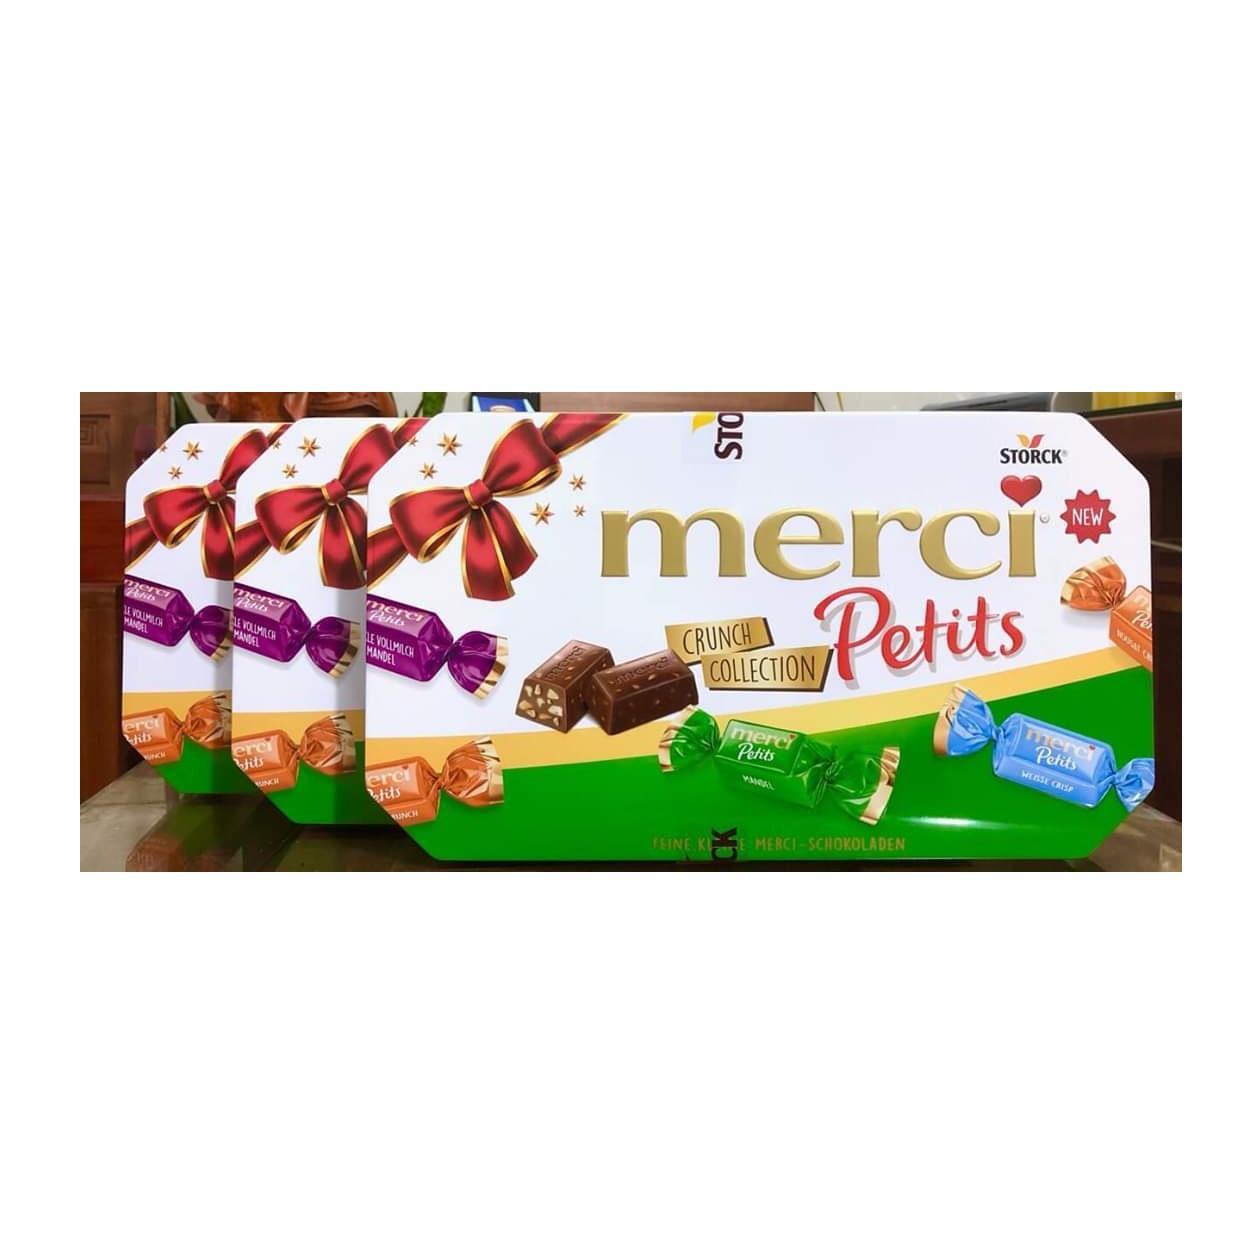 Kẹo socola Merci Petits new